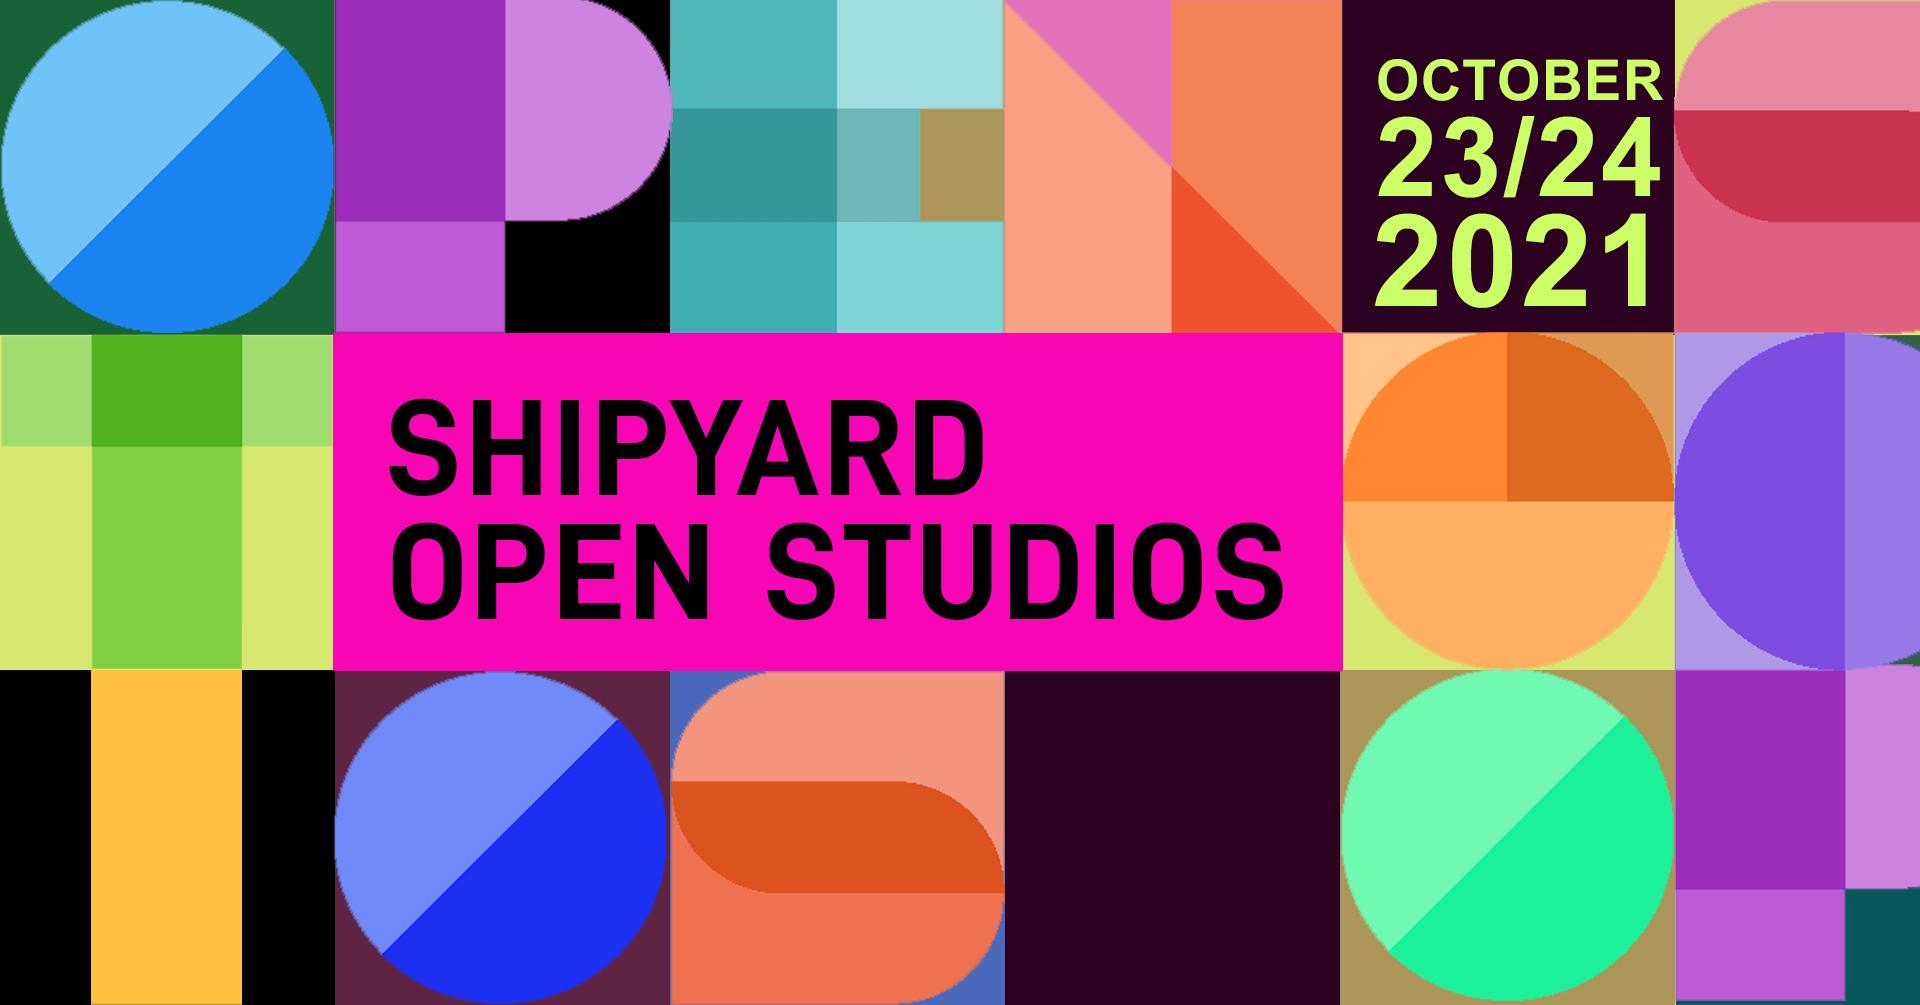 Shipyard Open Studios